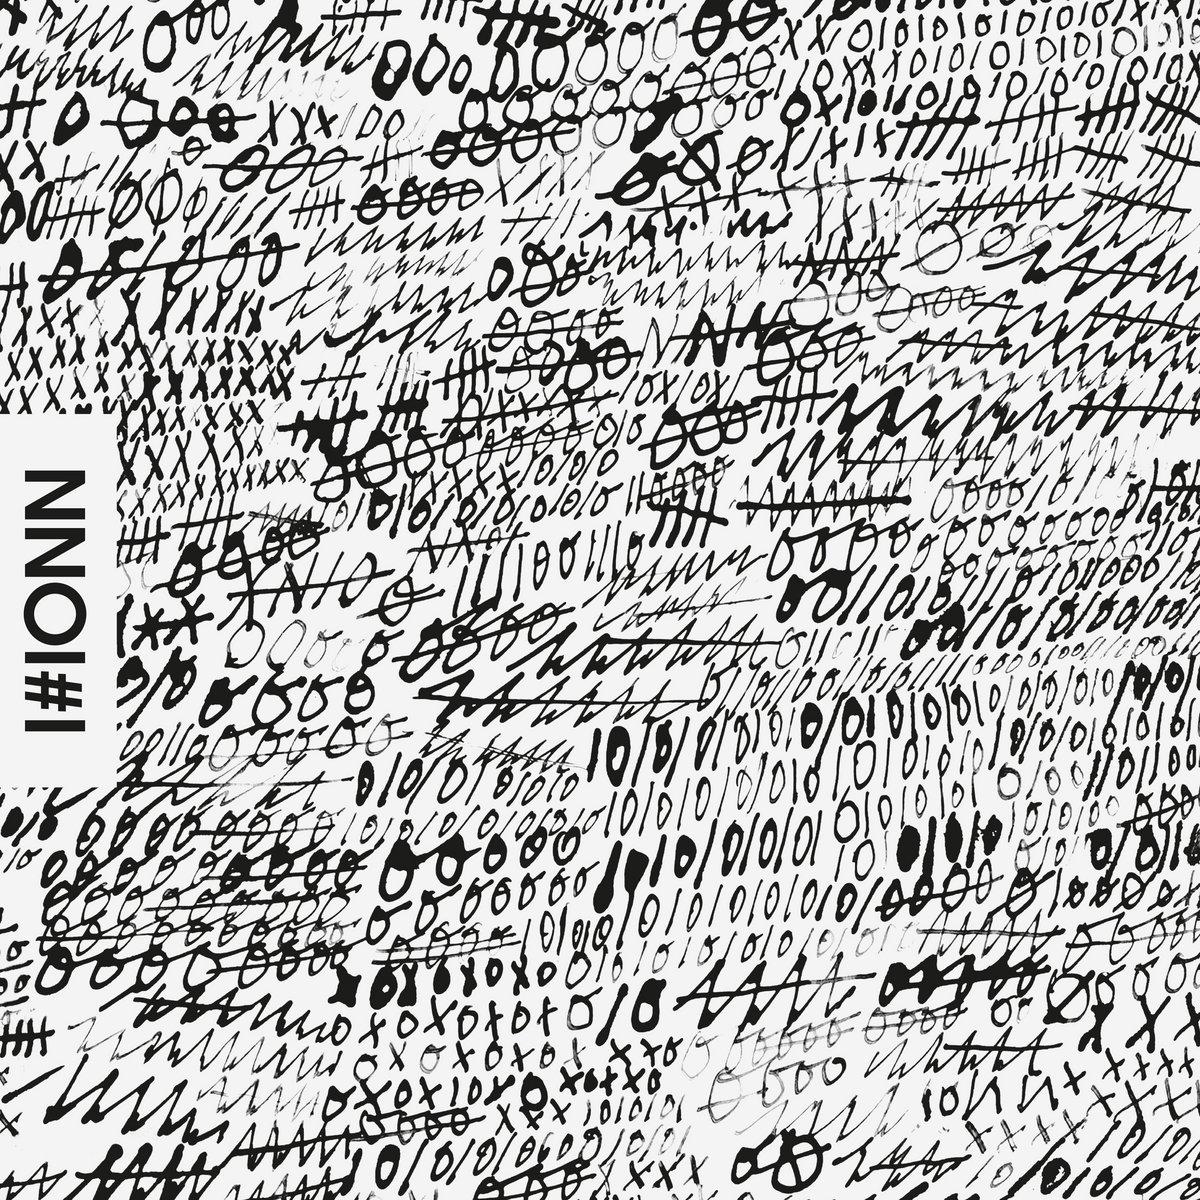 NNOI#I - Felix Kubin/Ditterich von Euler-Donnersperg